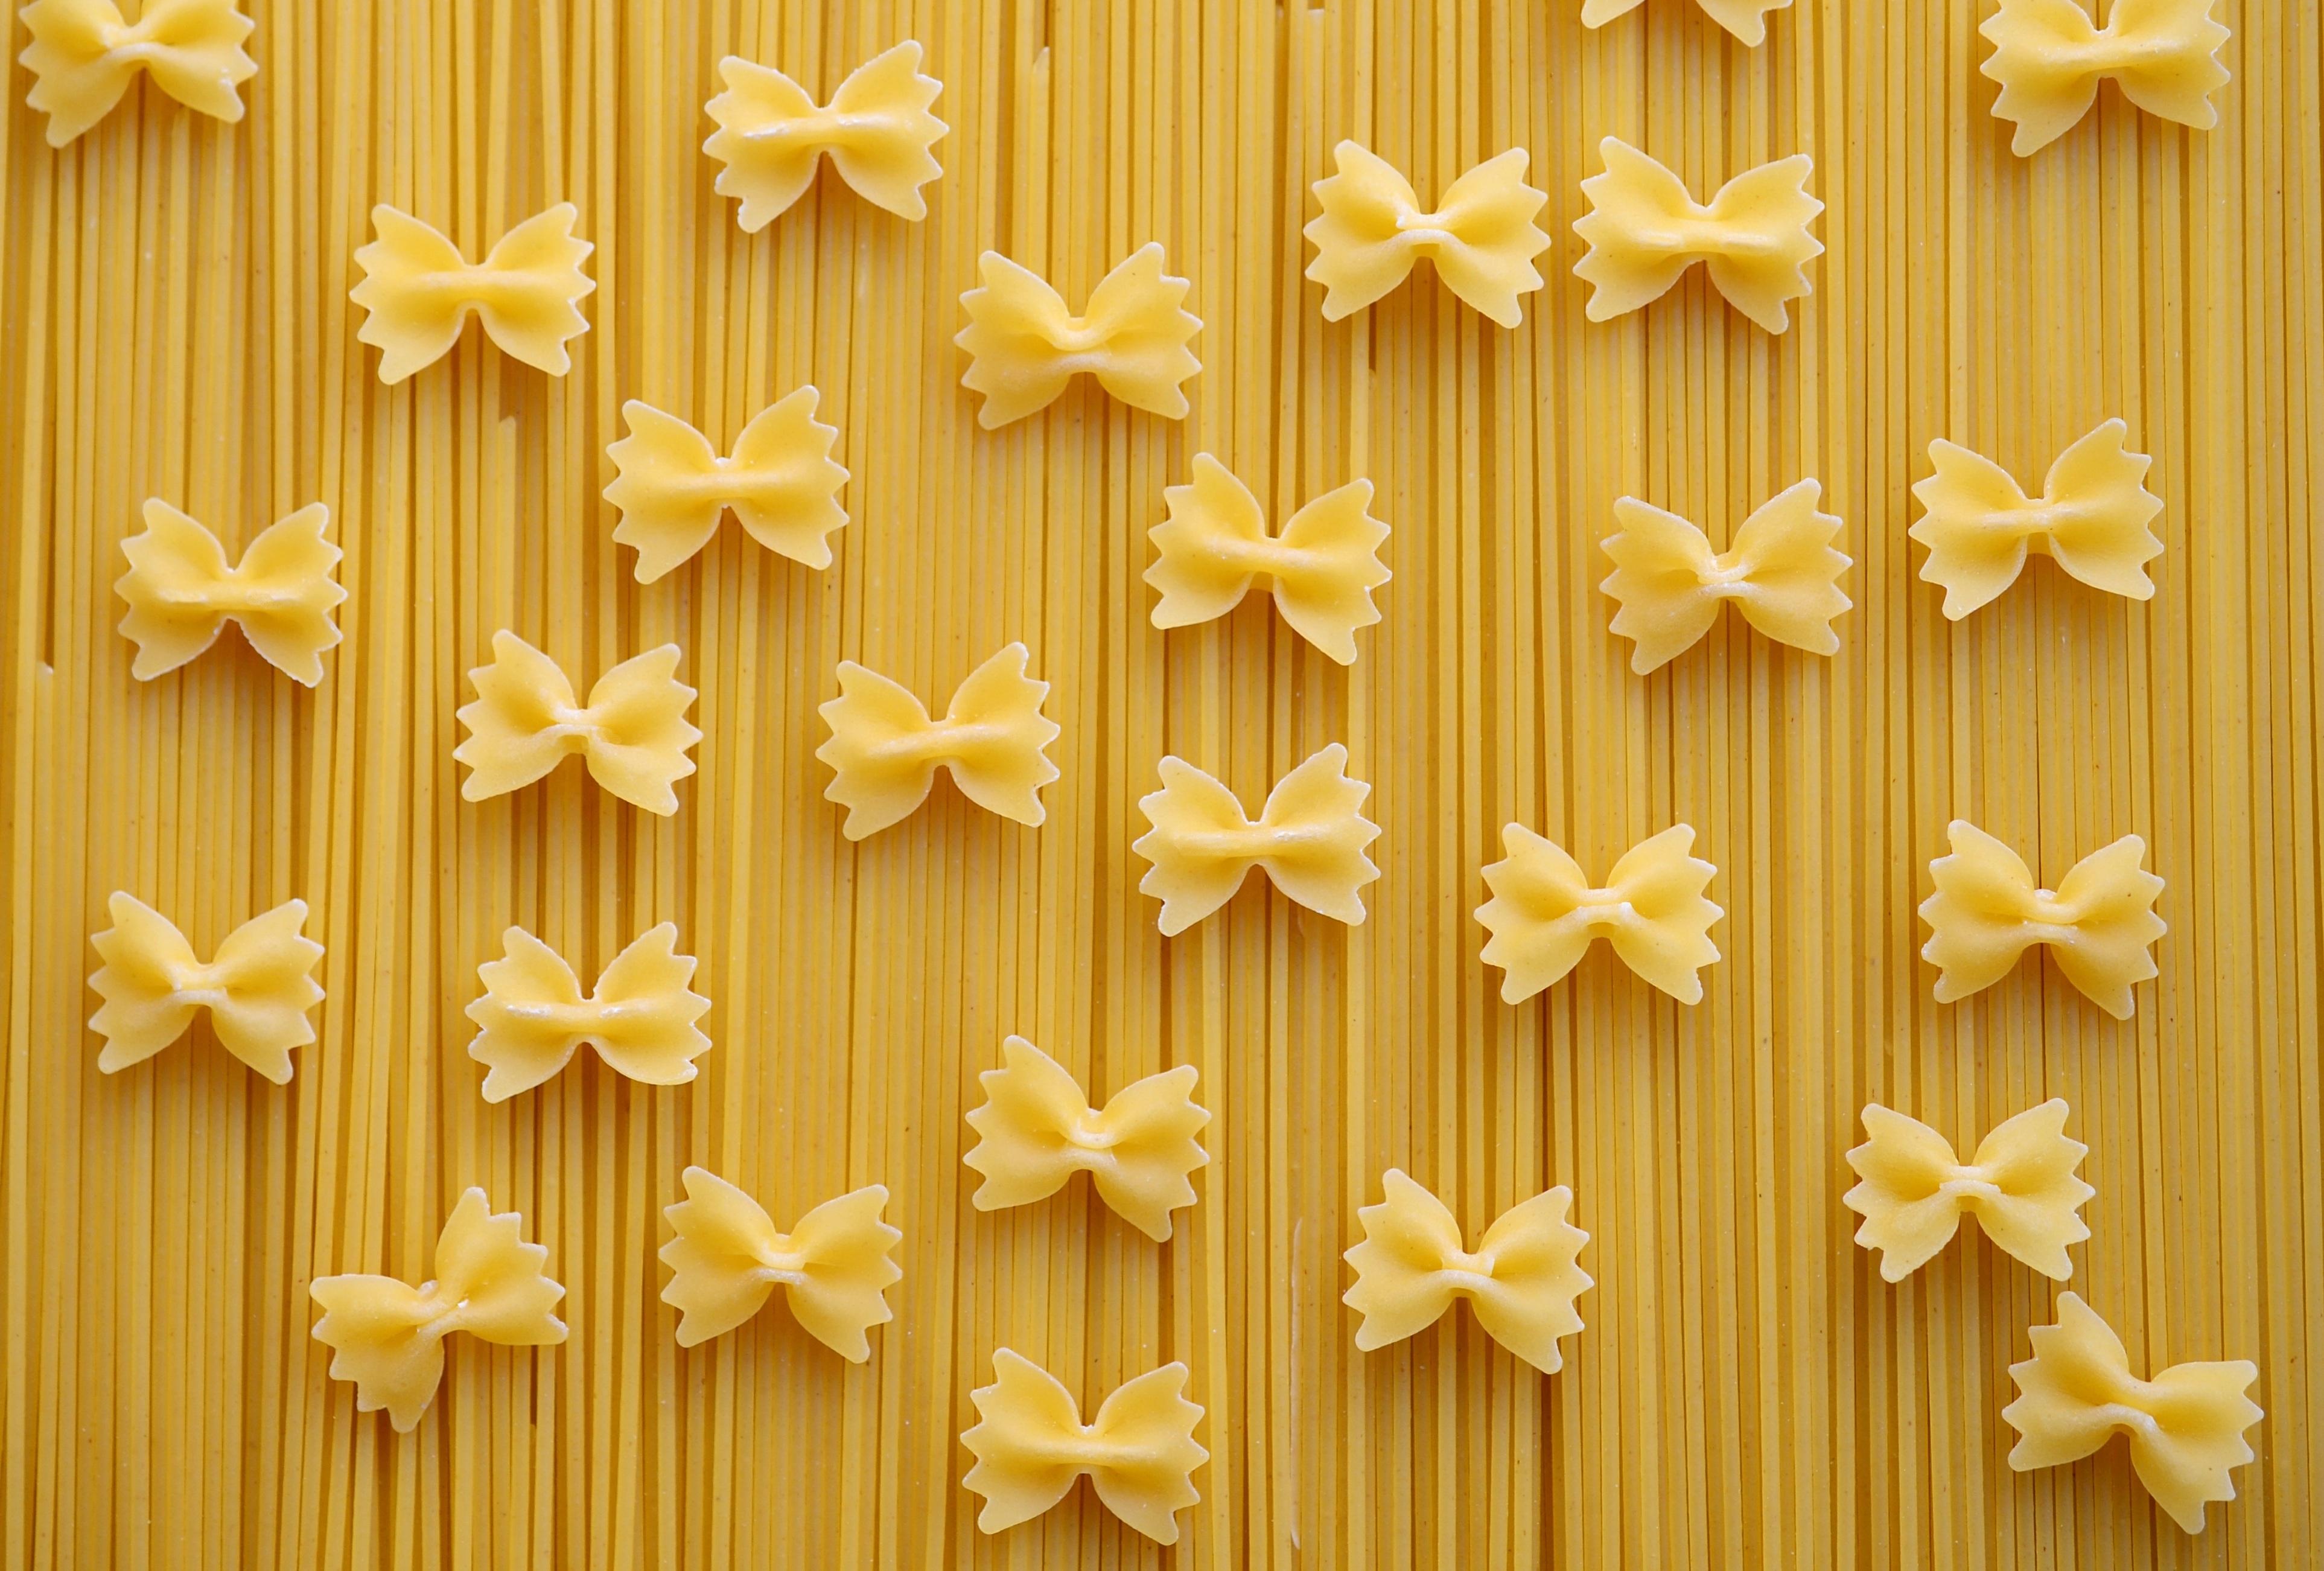 peas love pasta noodles-pasta-spaghetti-farfalle-42326 healthy-pasta